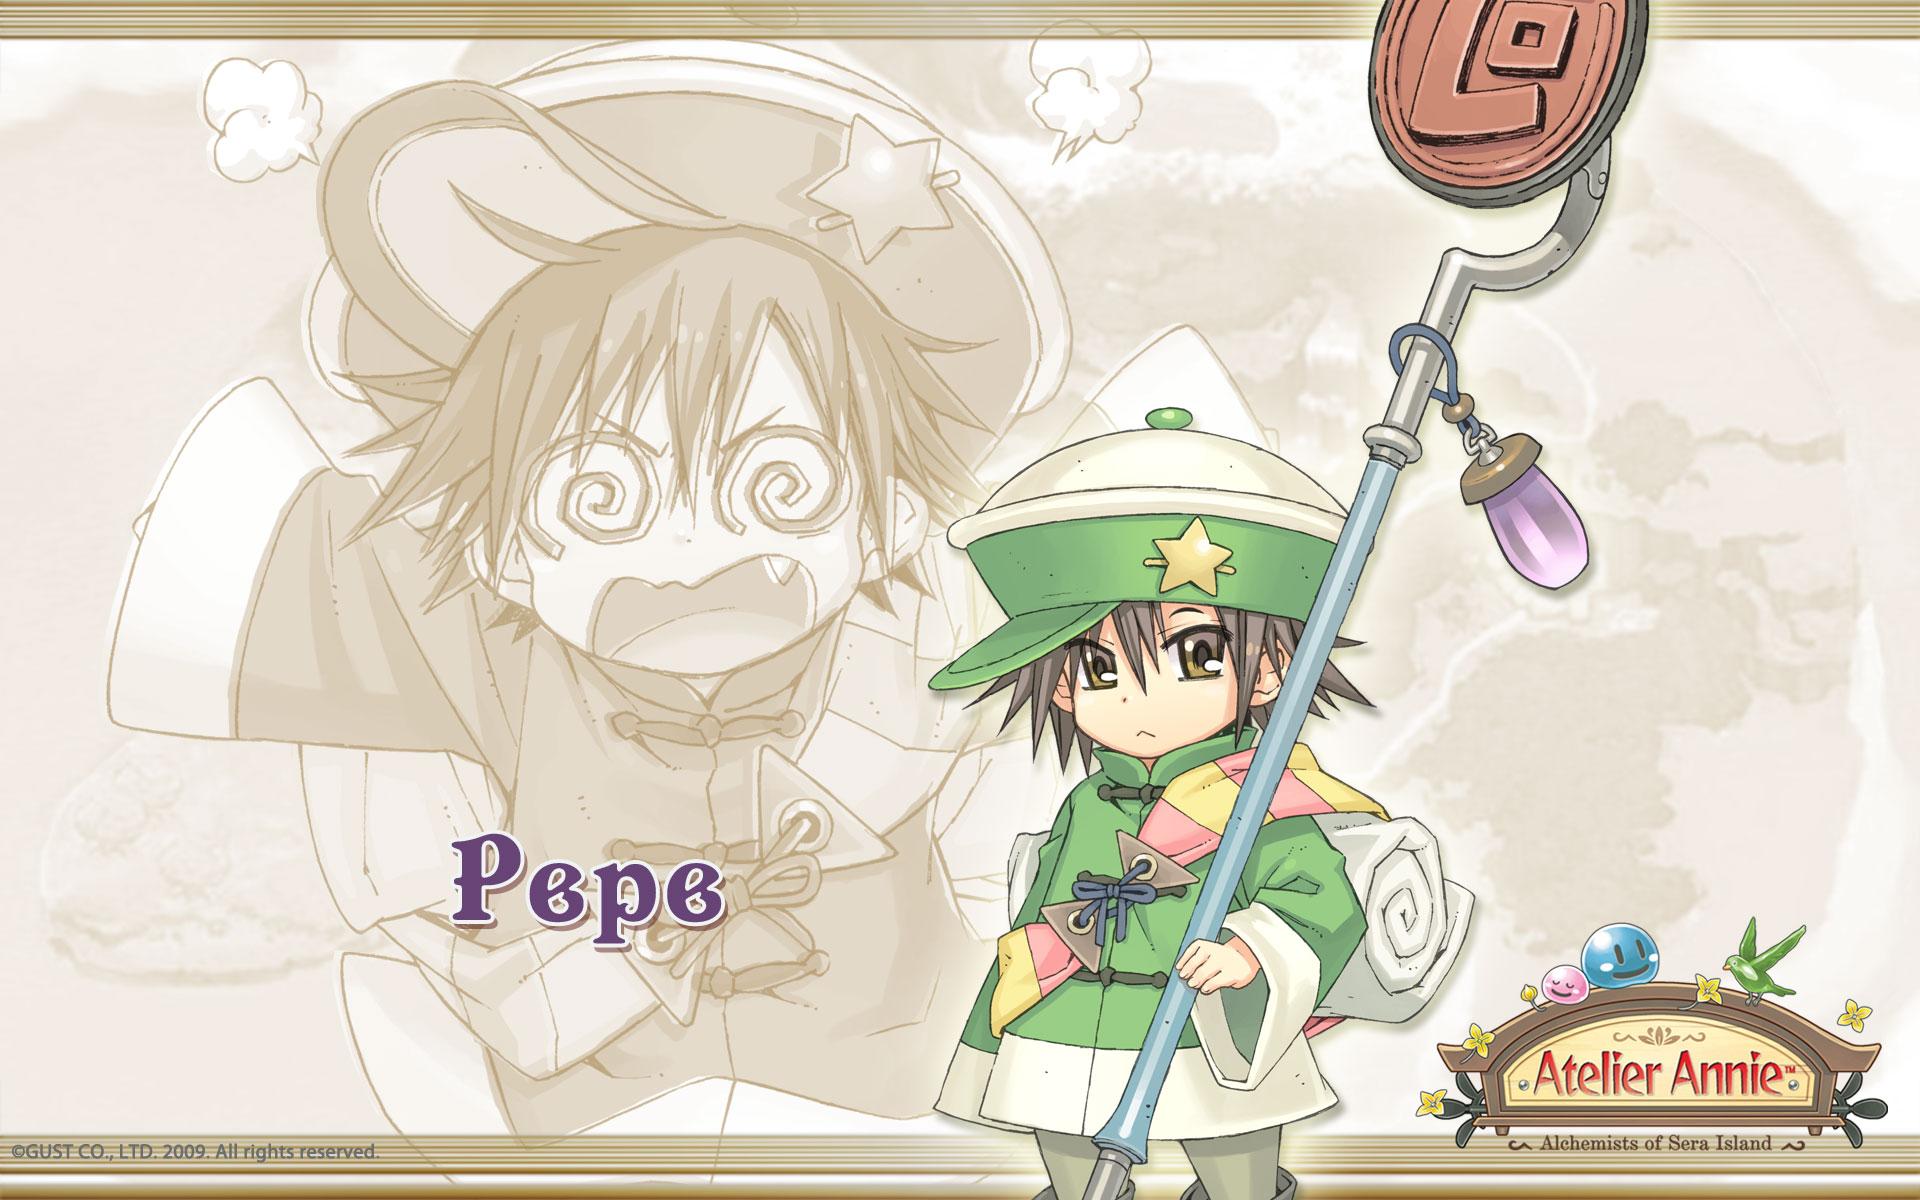 Atelier Annie Alchemists of Sera Island Wallpaper 004 Pepe